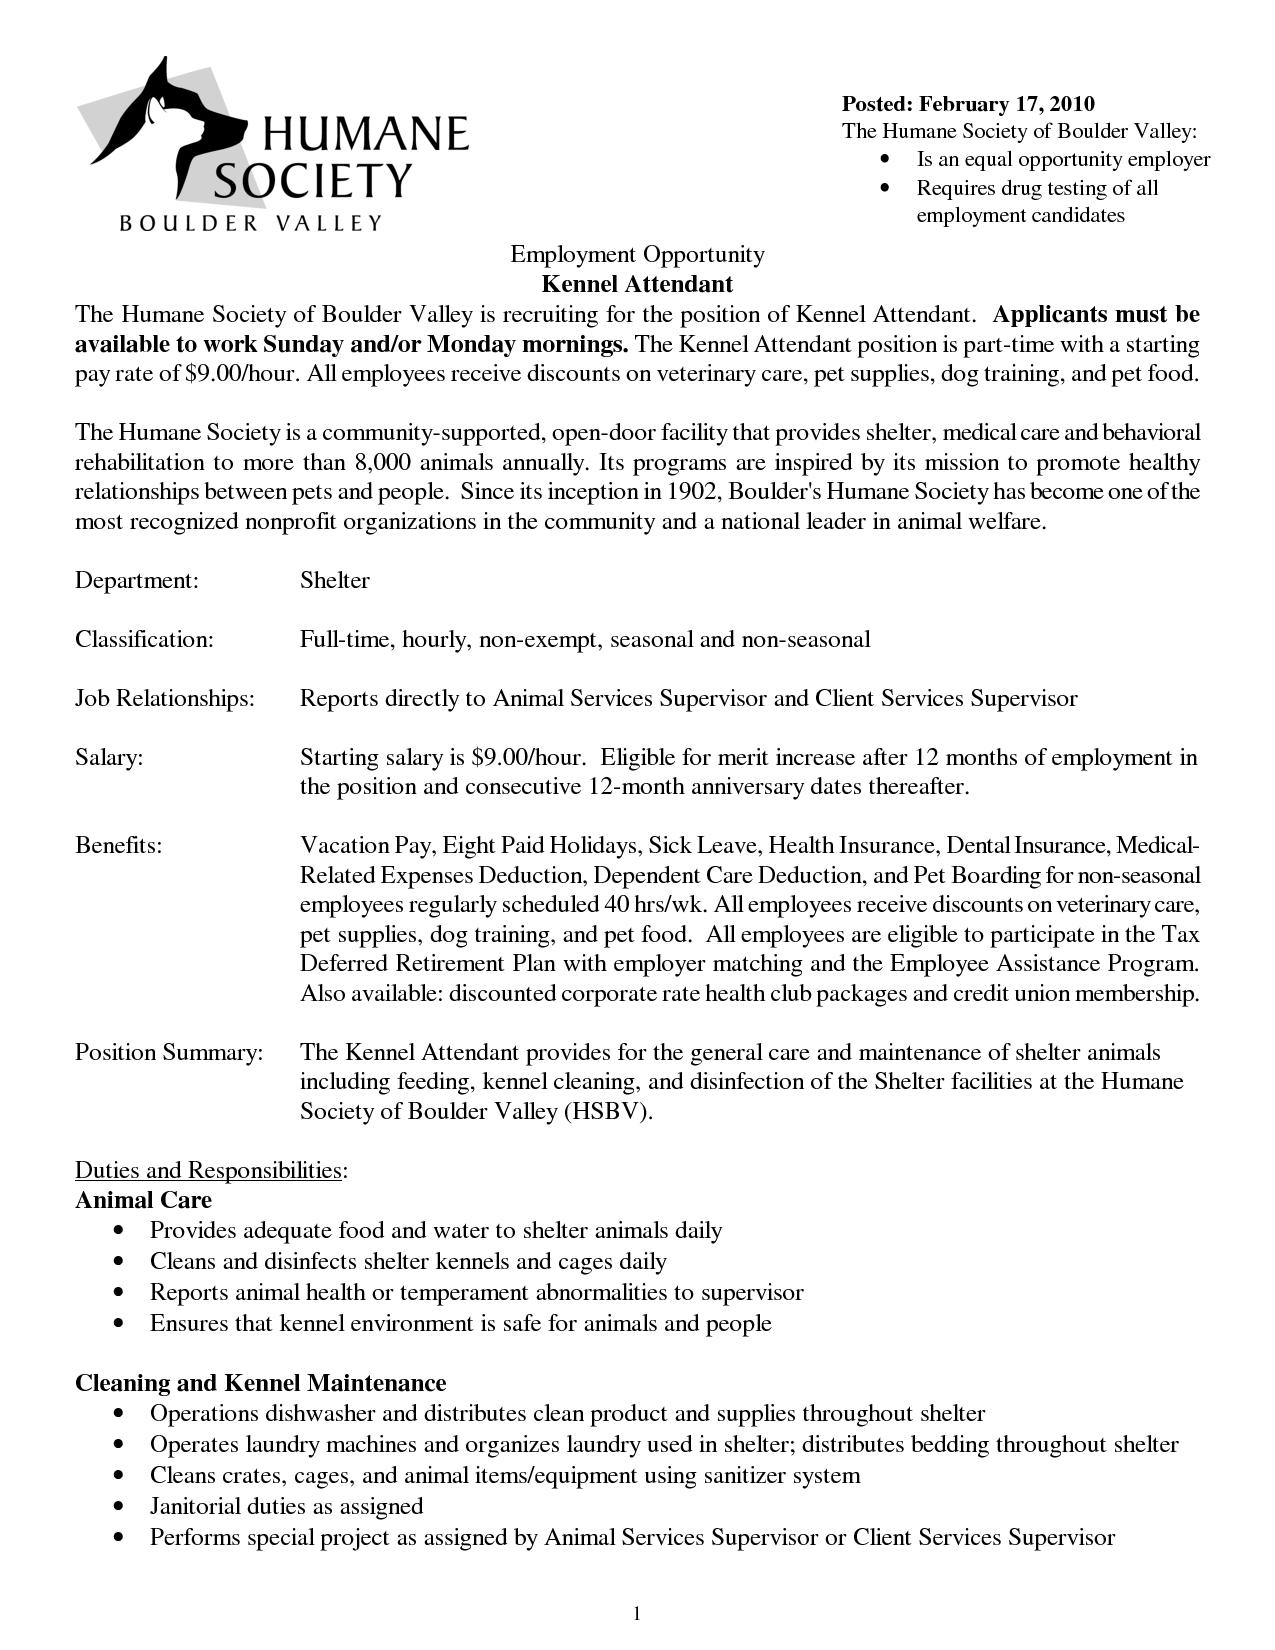 Cover Letter Examples For Vet Jobs Resume Internship Doc Veterinarian Nurse Experience Dog